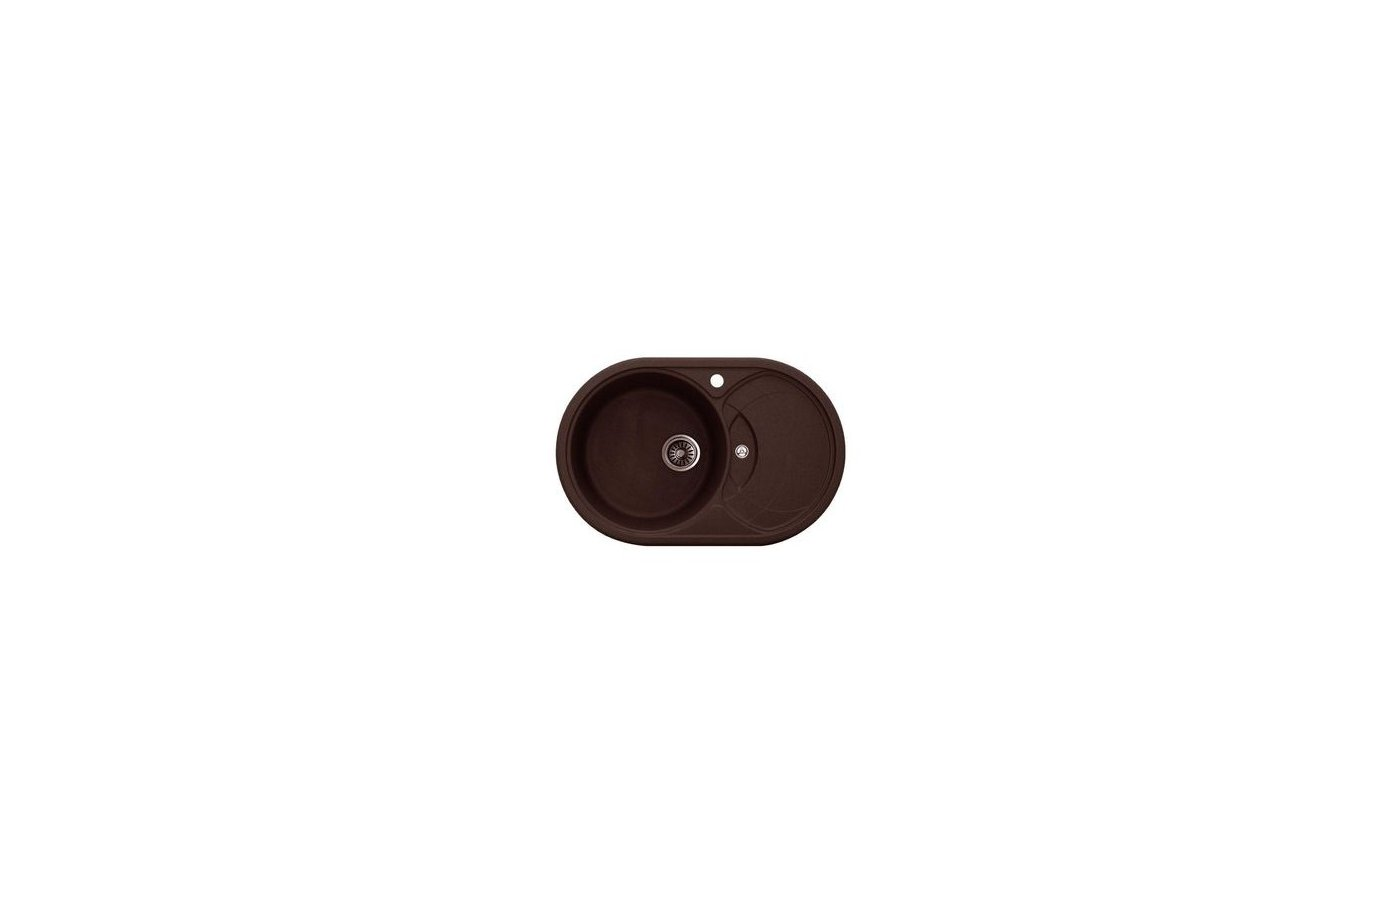 Кухонная мойка Weissgauff ASCOT 780 Eco Granit шоколад